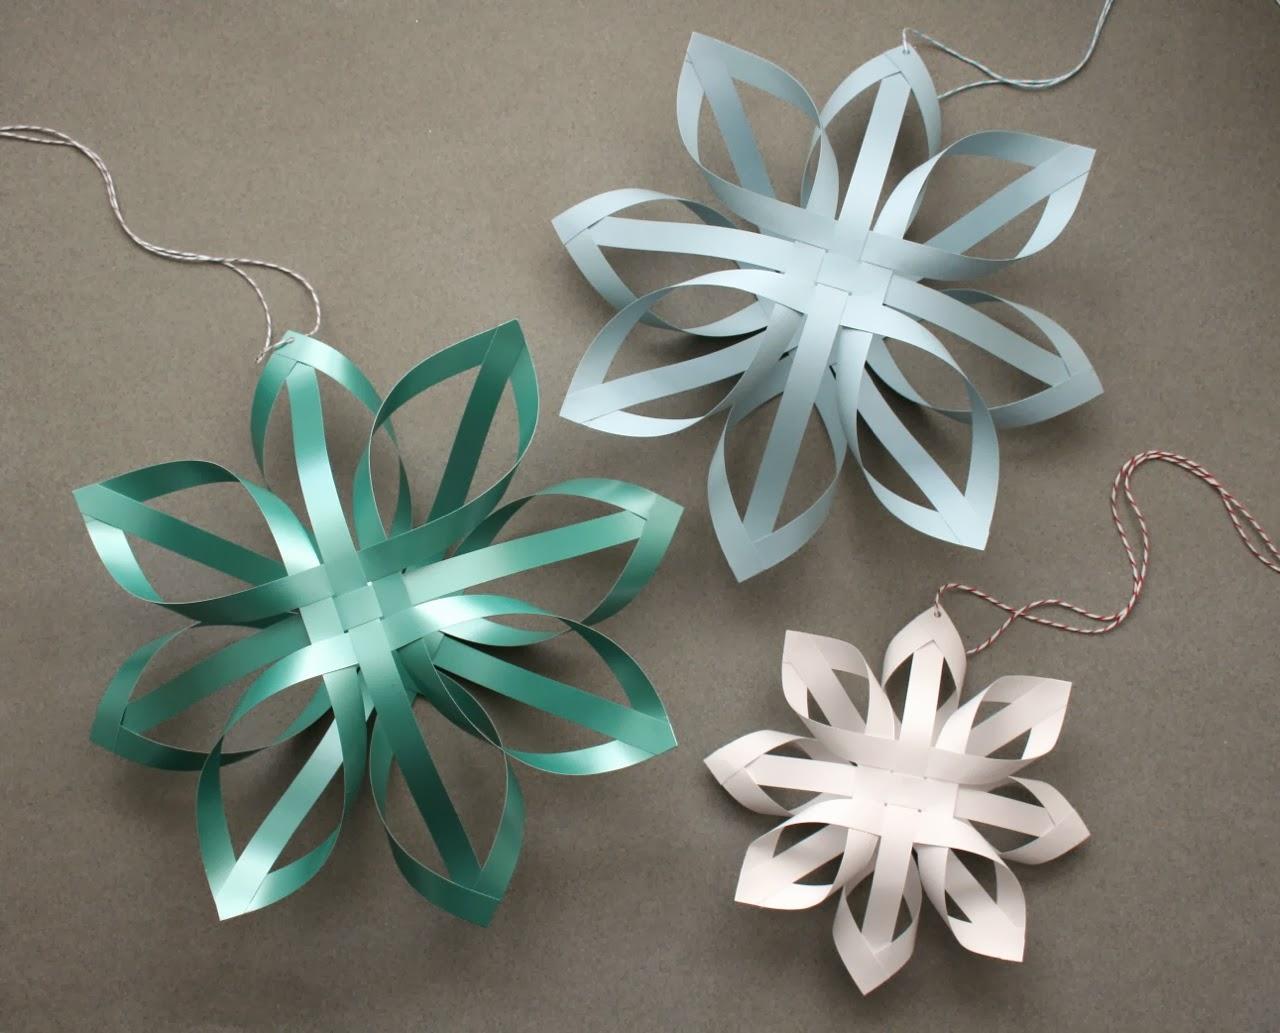 Handmade Gifts 2013 Part 3